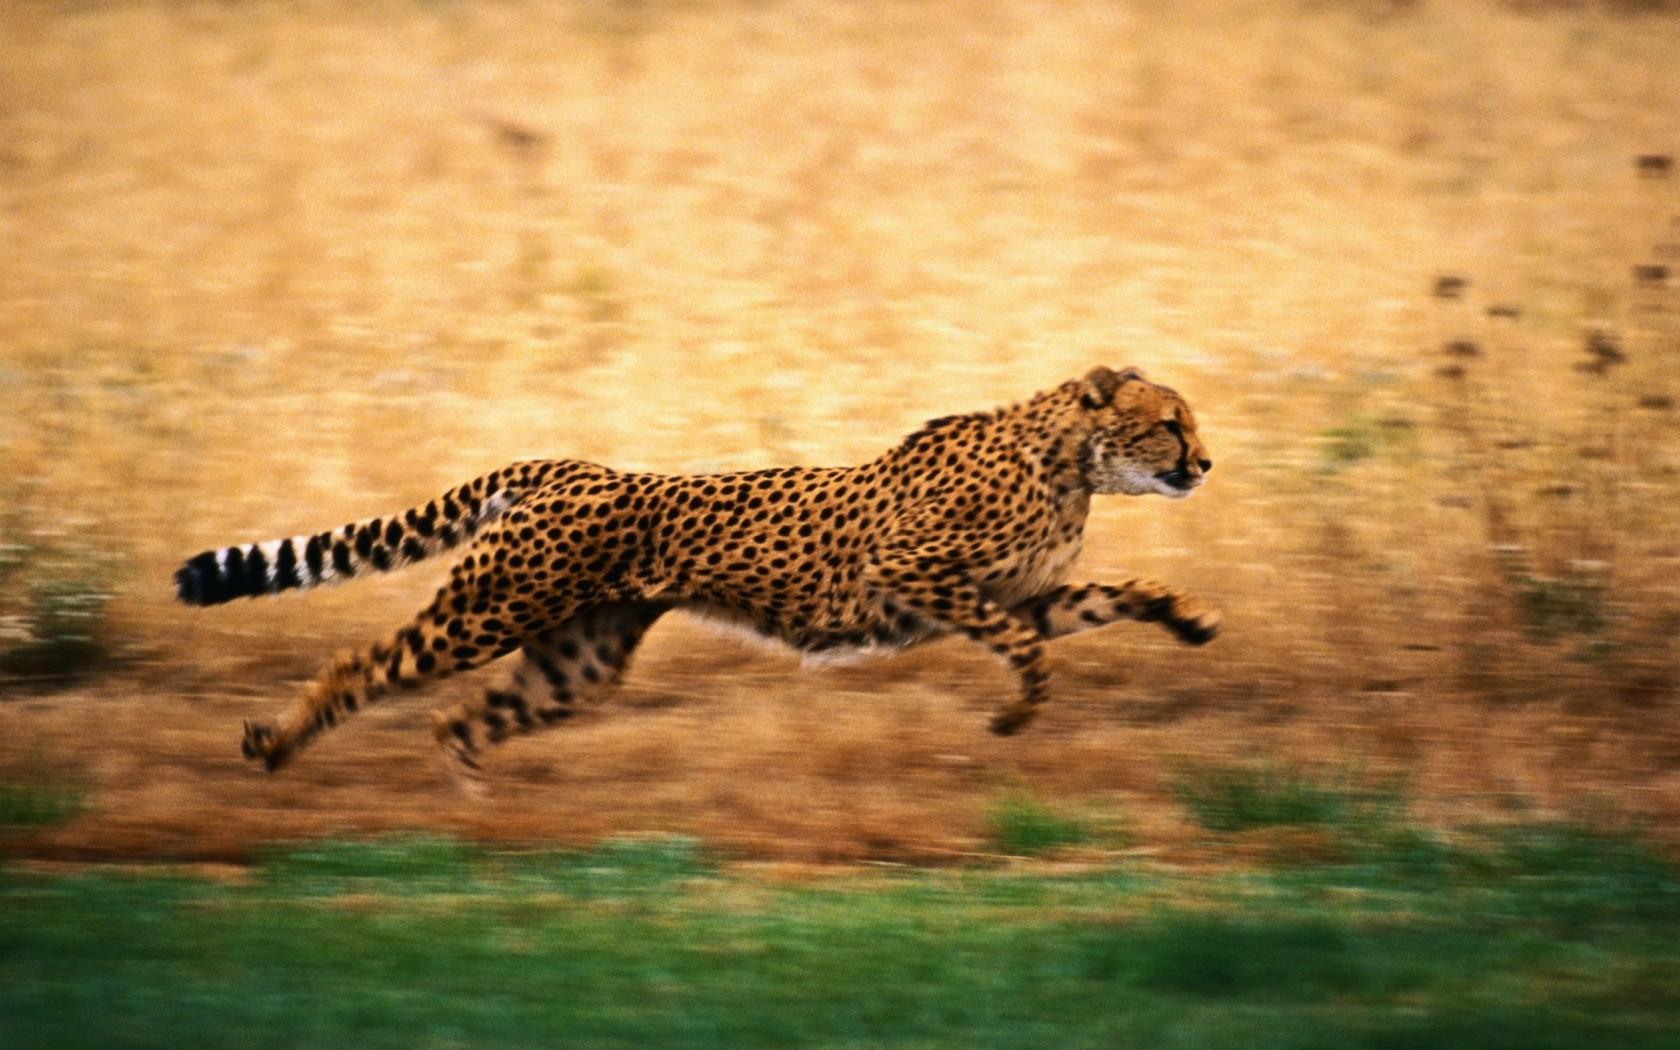 Leopardo corriendo - 1680x1050